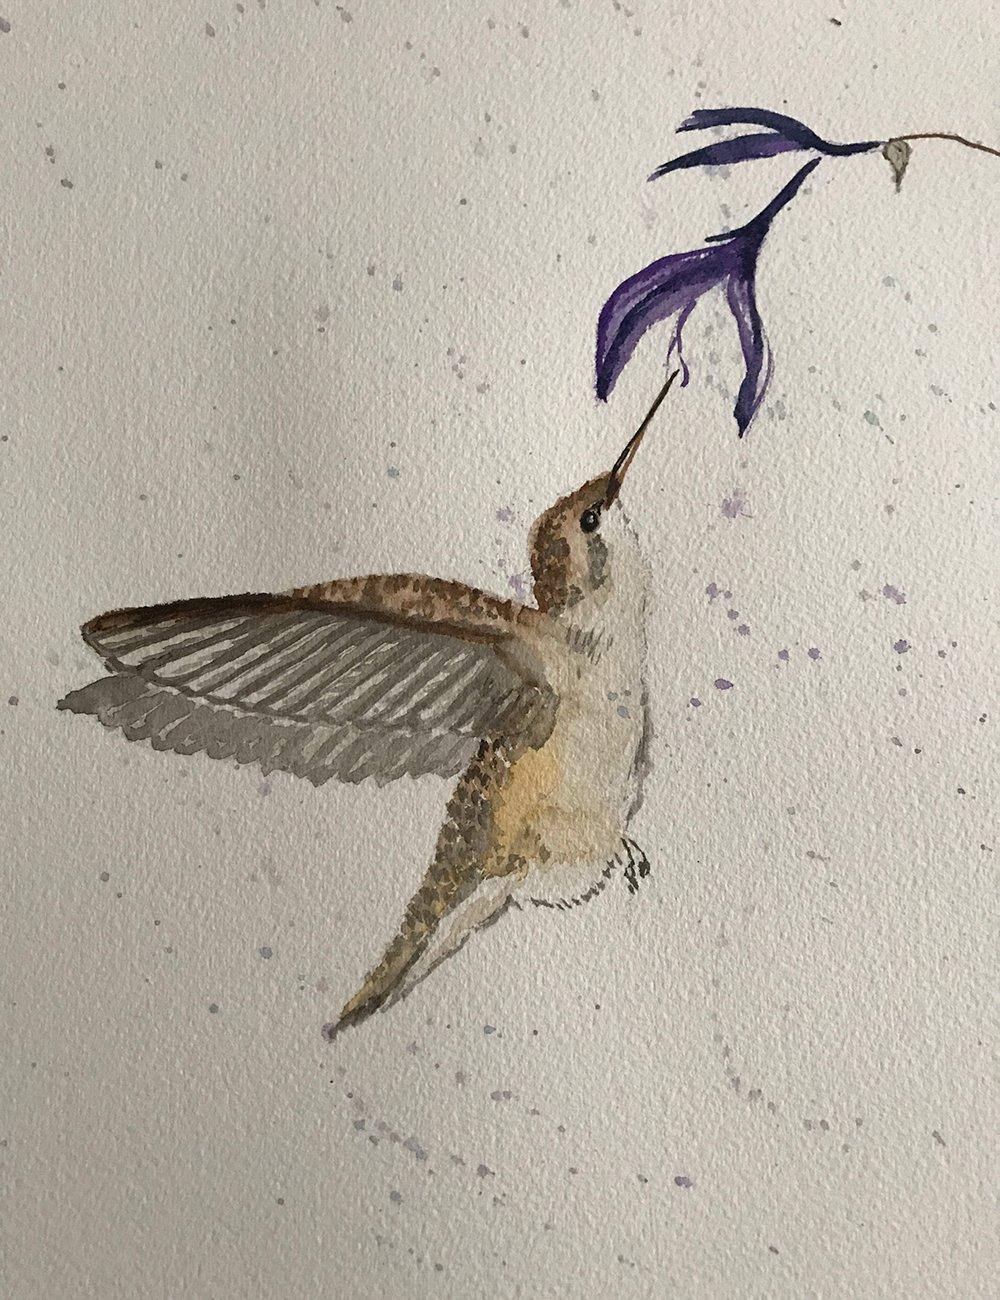 2-Ruby-Throated-Hummingbird-jackie-clare-louis